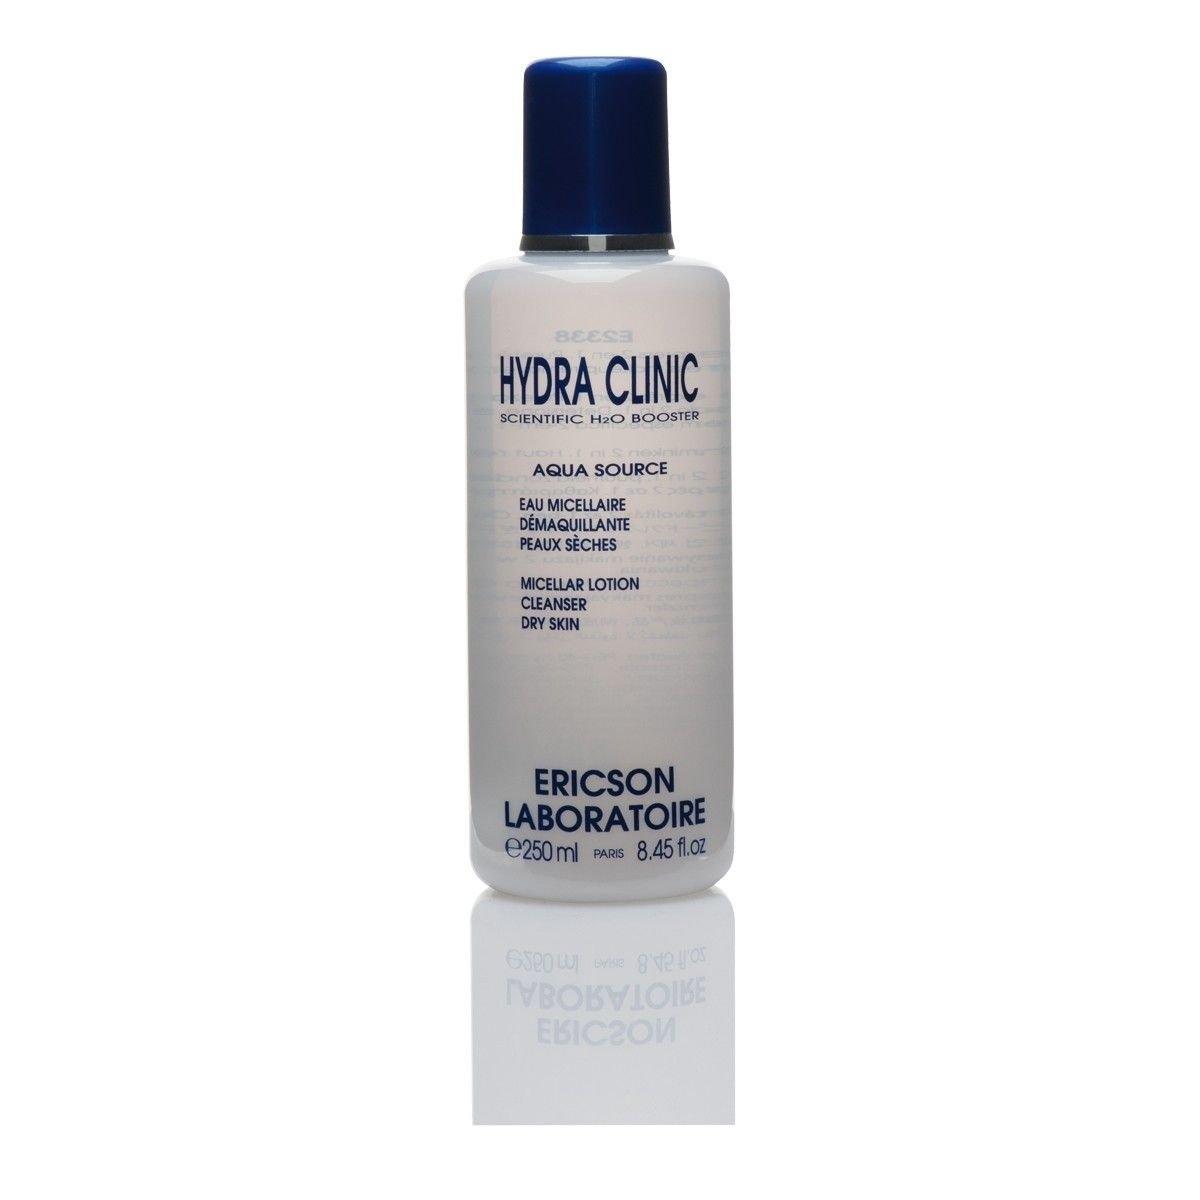 Afbeelding van Ericson Laboratoire Aqua Source Micellar Lotion Cleanser Hydra Clinic Droge huid Beauty